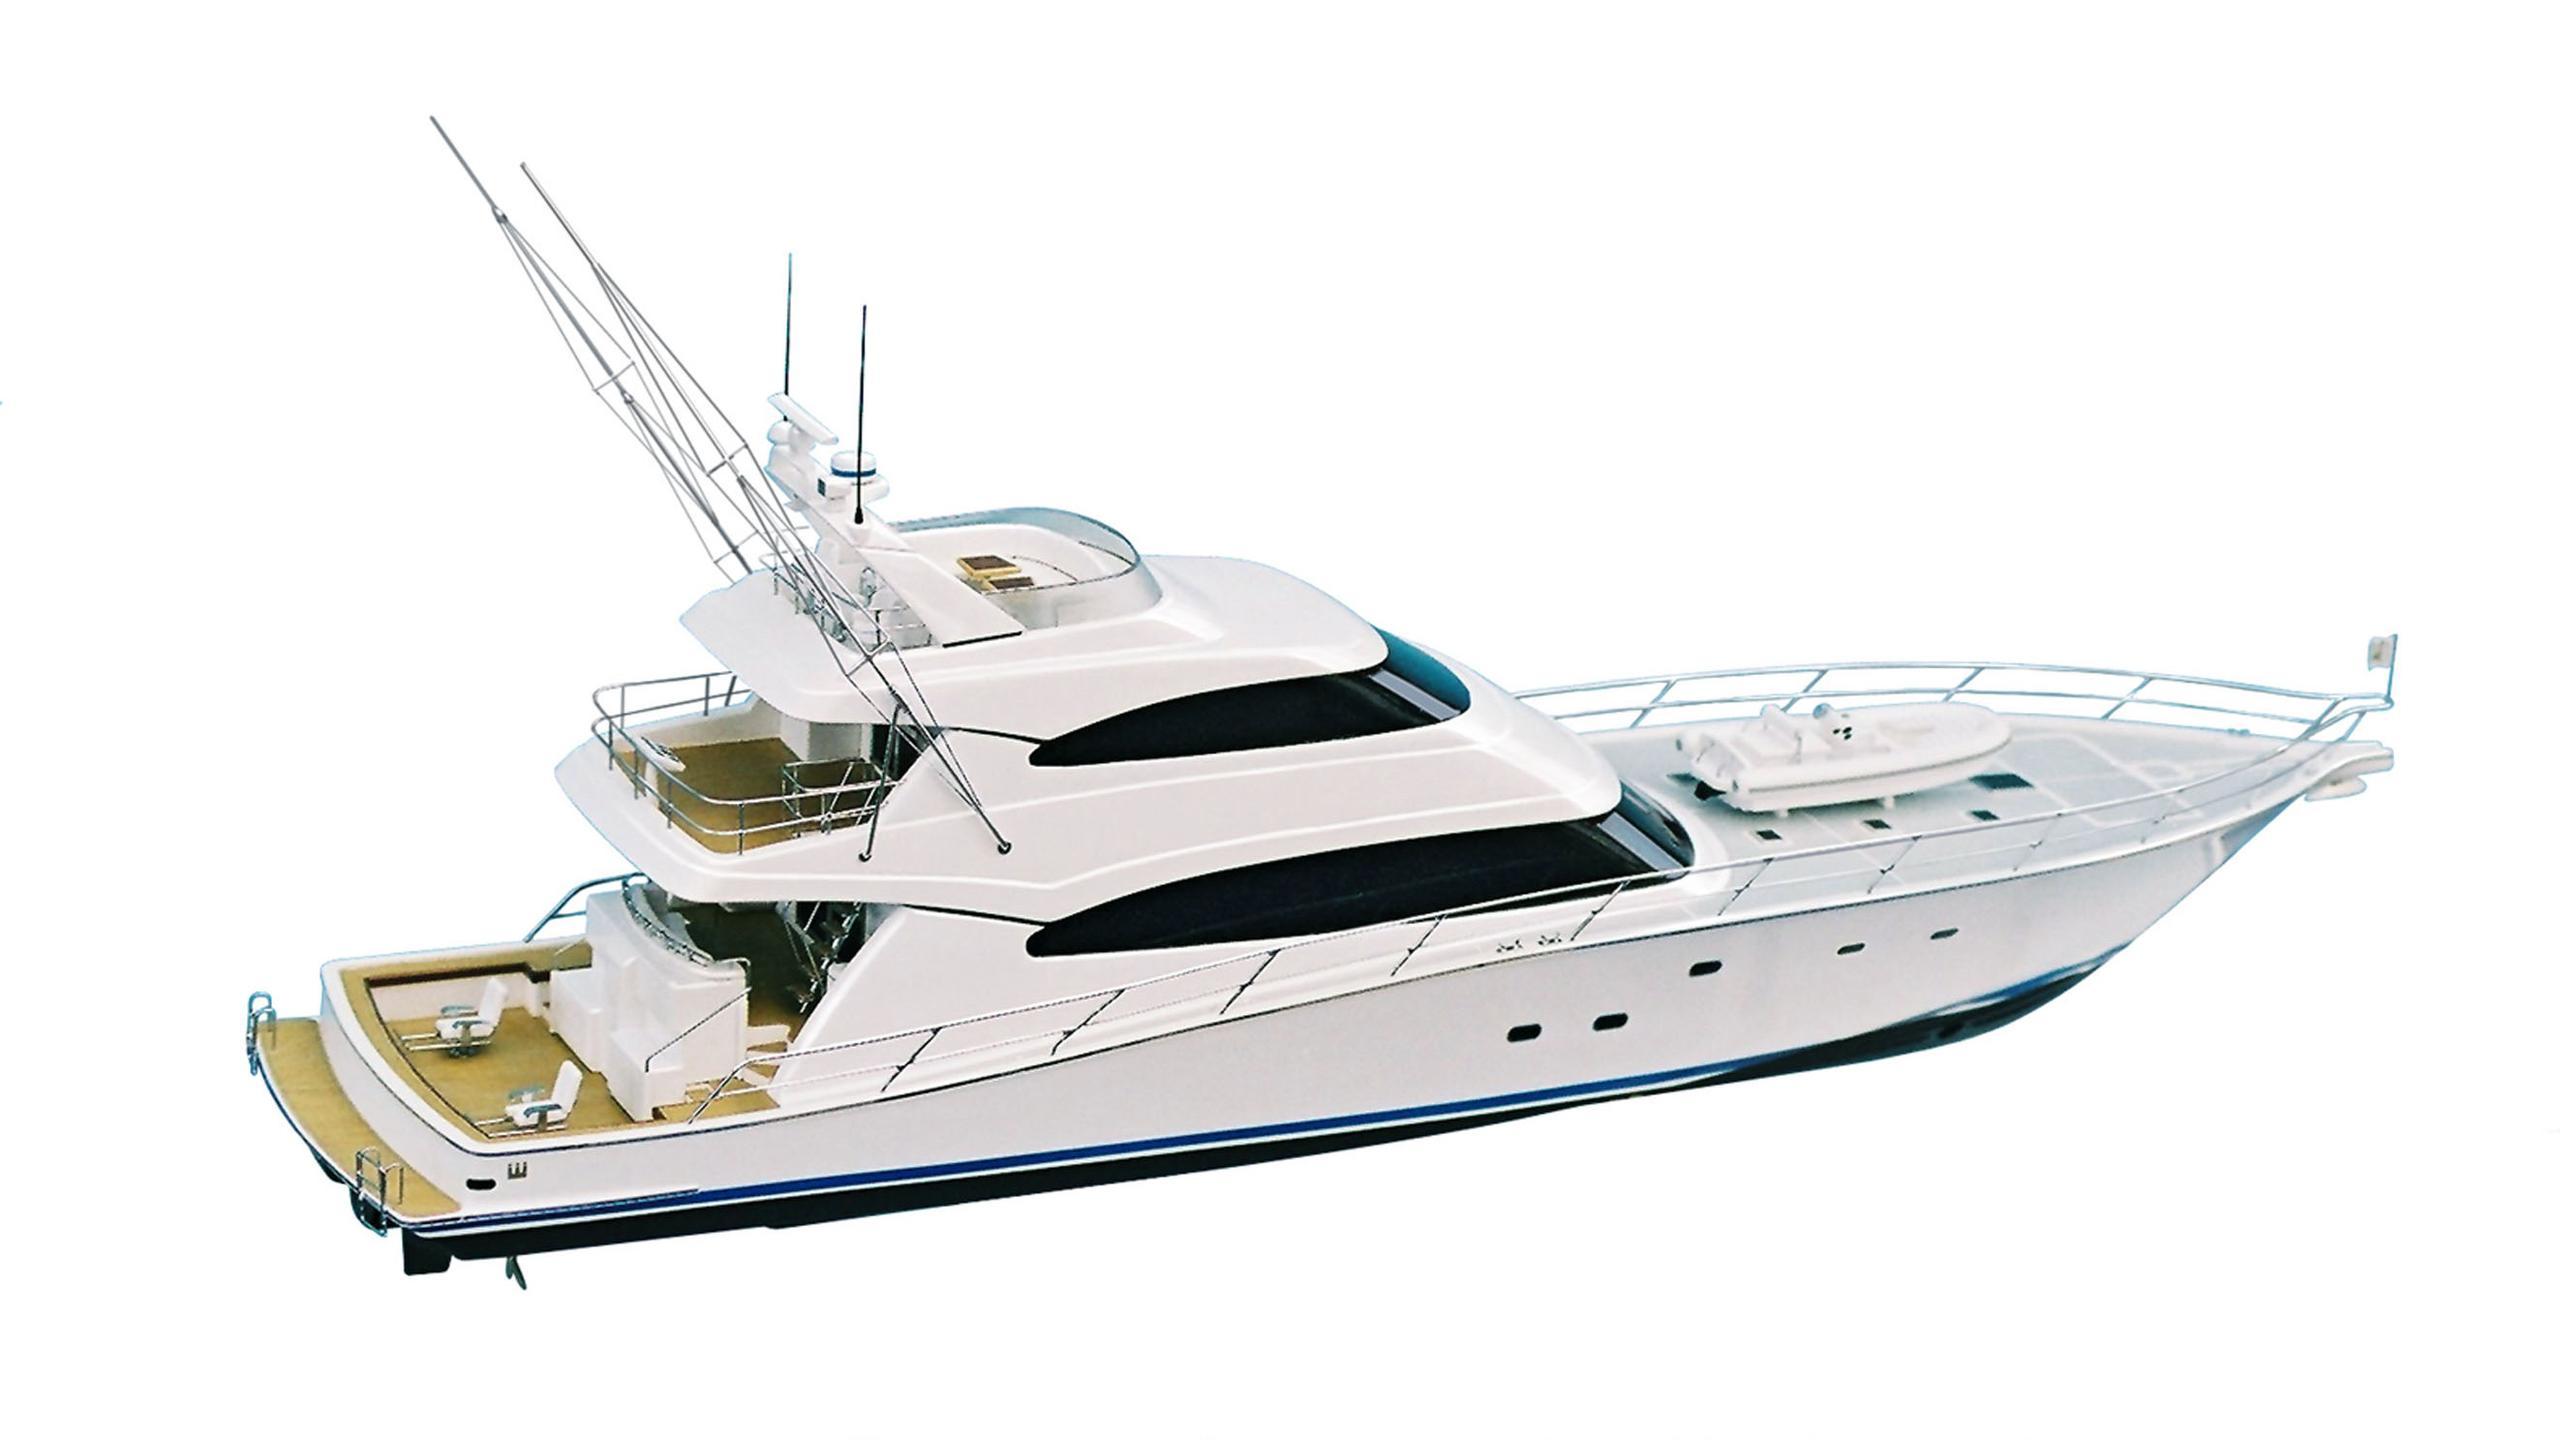 yd 1017 motoryacht yachting developments 33m 2020 rendering